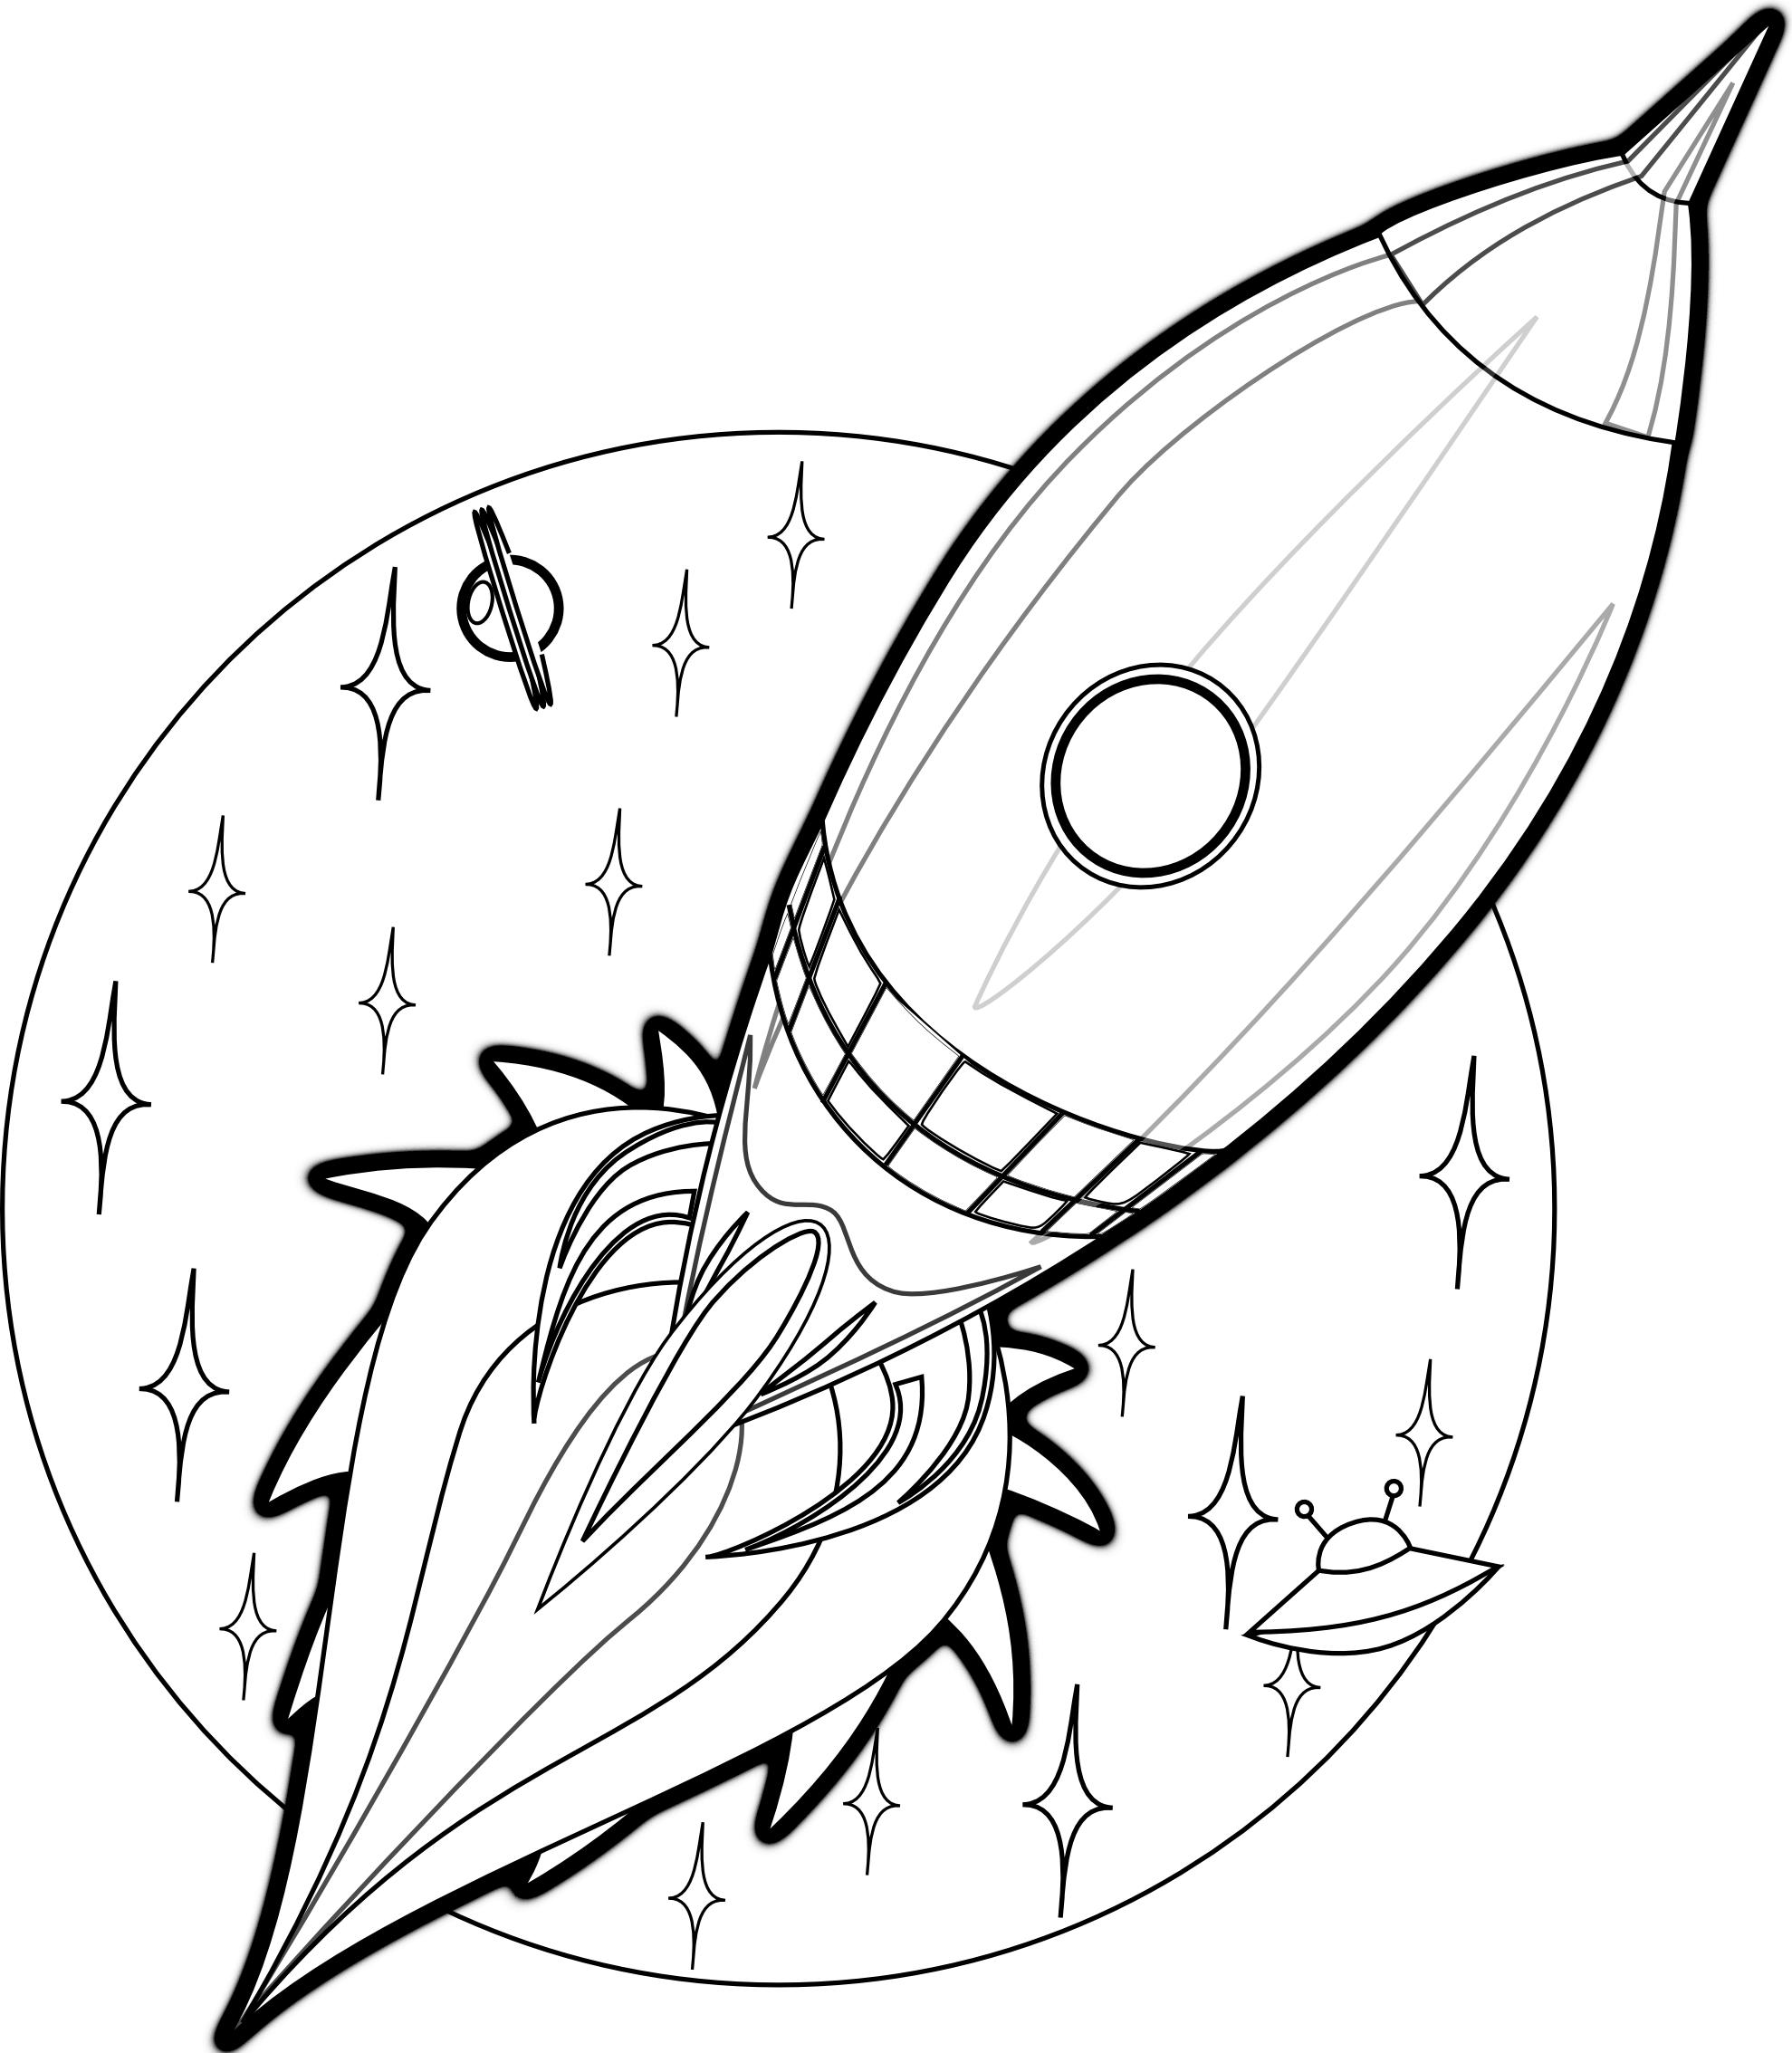 rocket ship coloring page free printable rocket ship coloring pages for kids vbs coloring page ship rocket